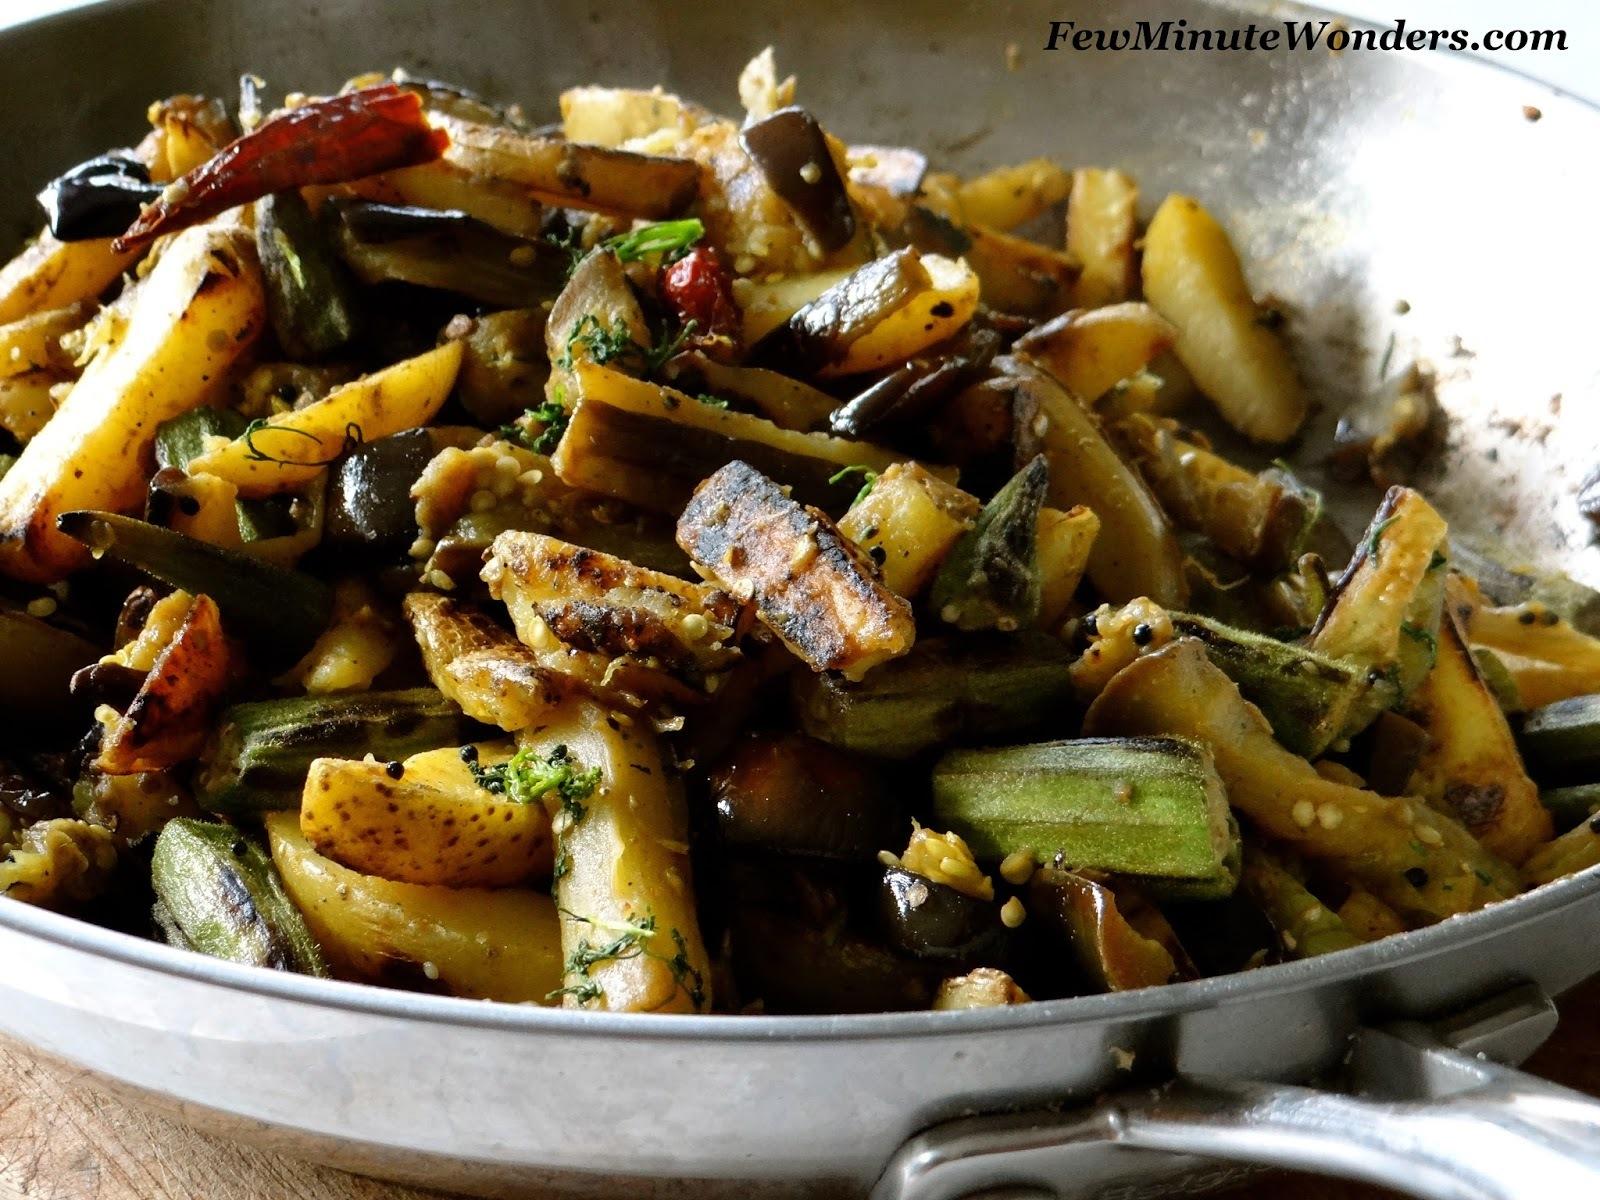 Brinjal Bhindi Potato Fry/ Eggplant Okra Potato Fry